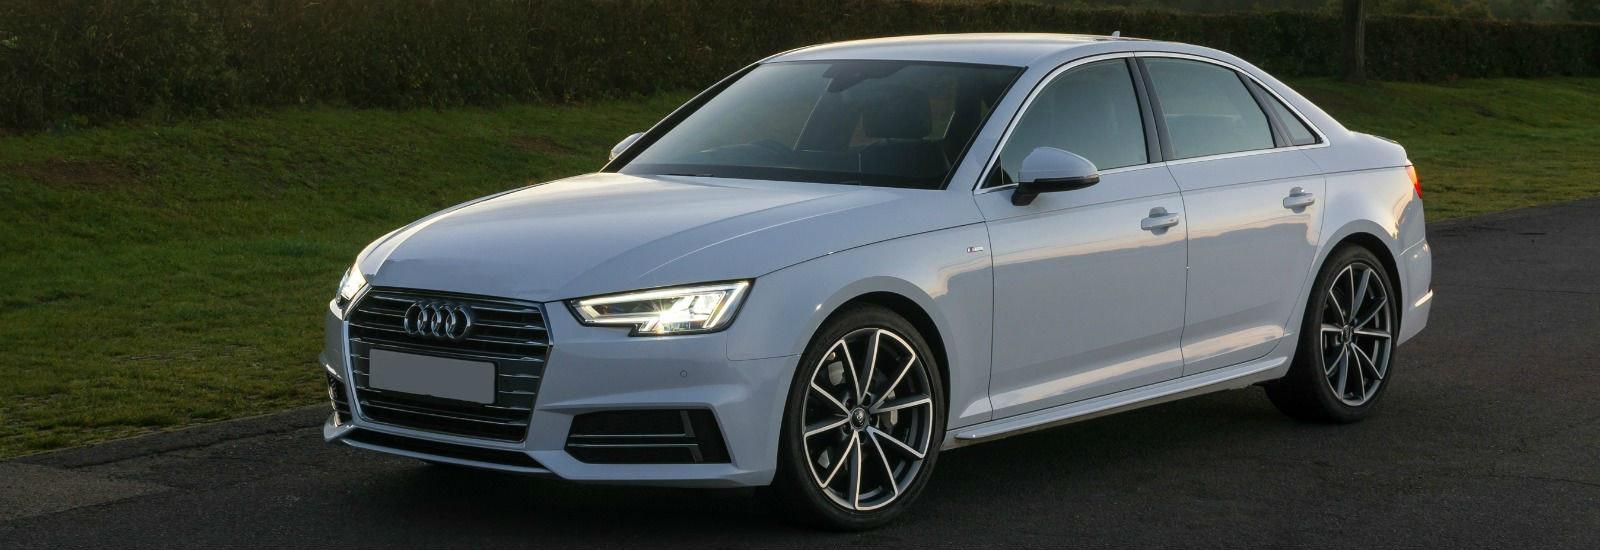 Audi Family Cars Reviews Carwow Autos Post